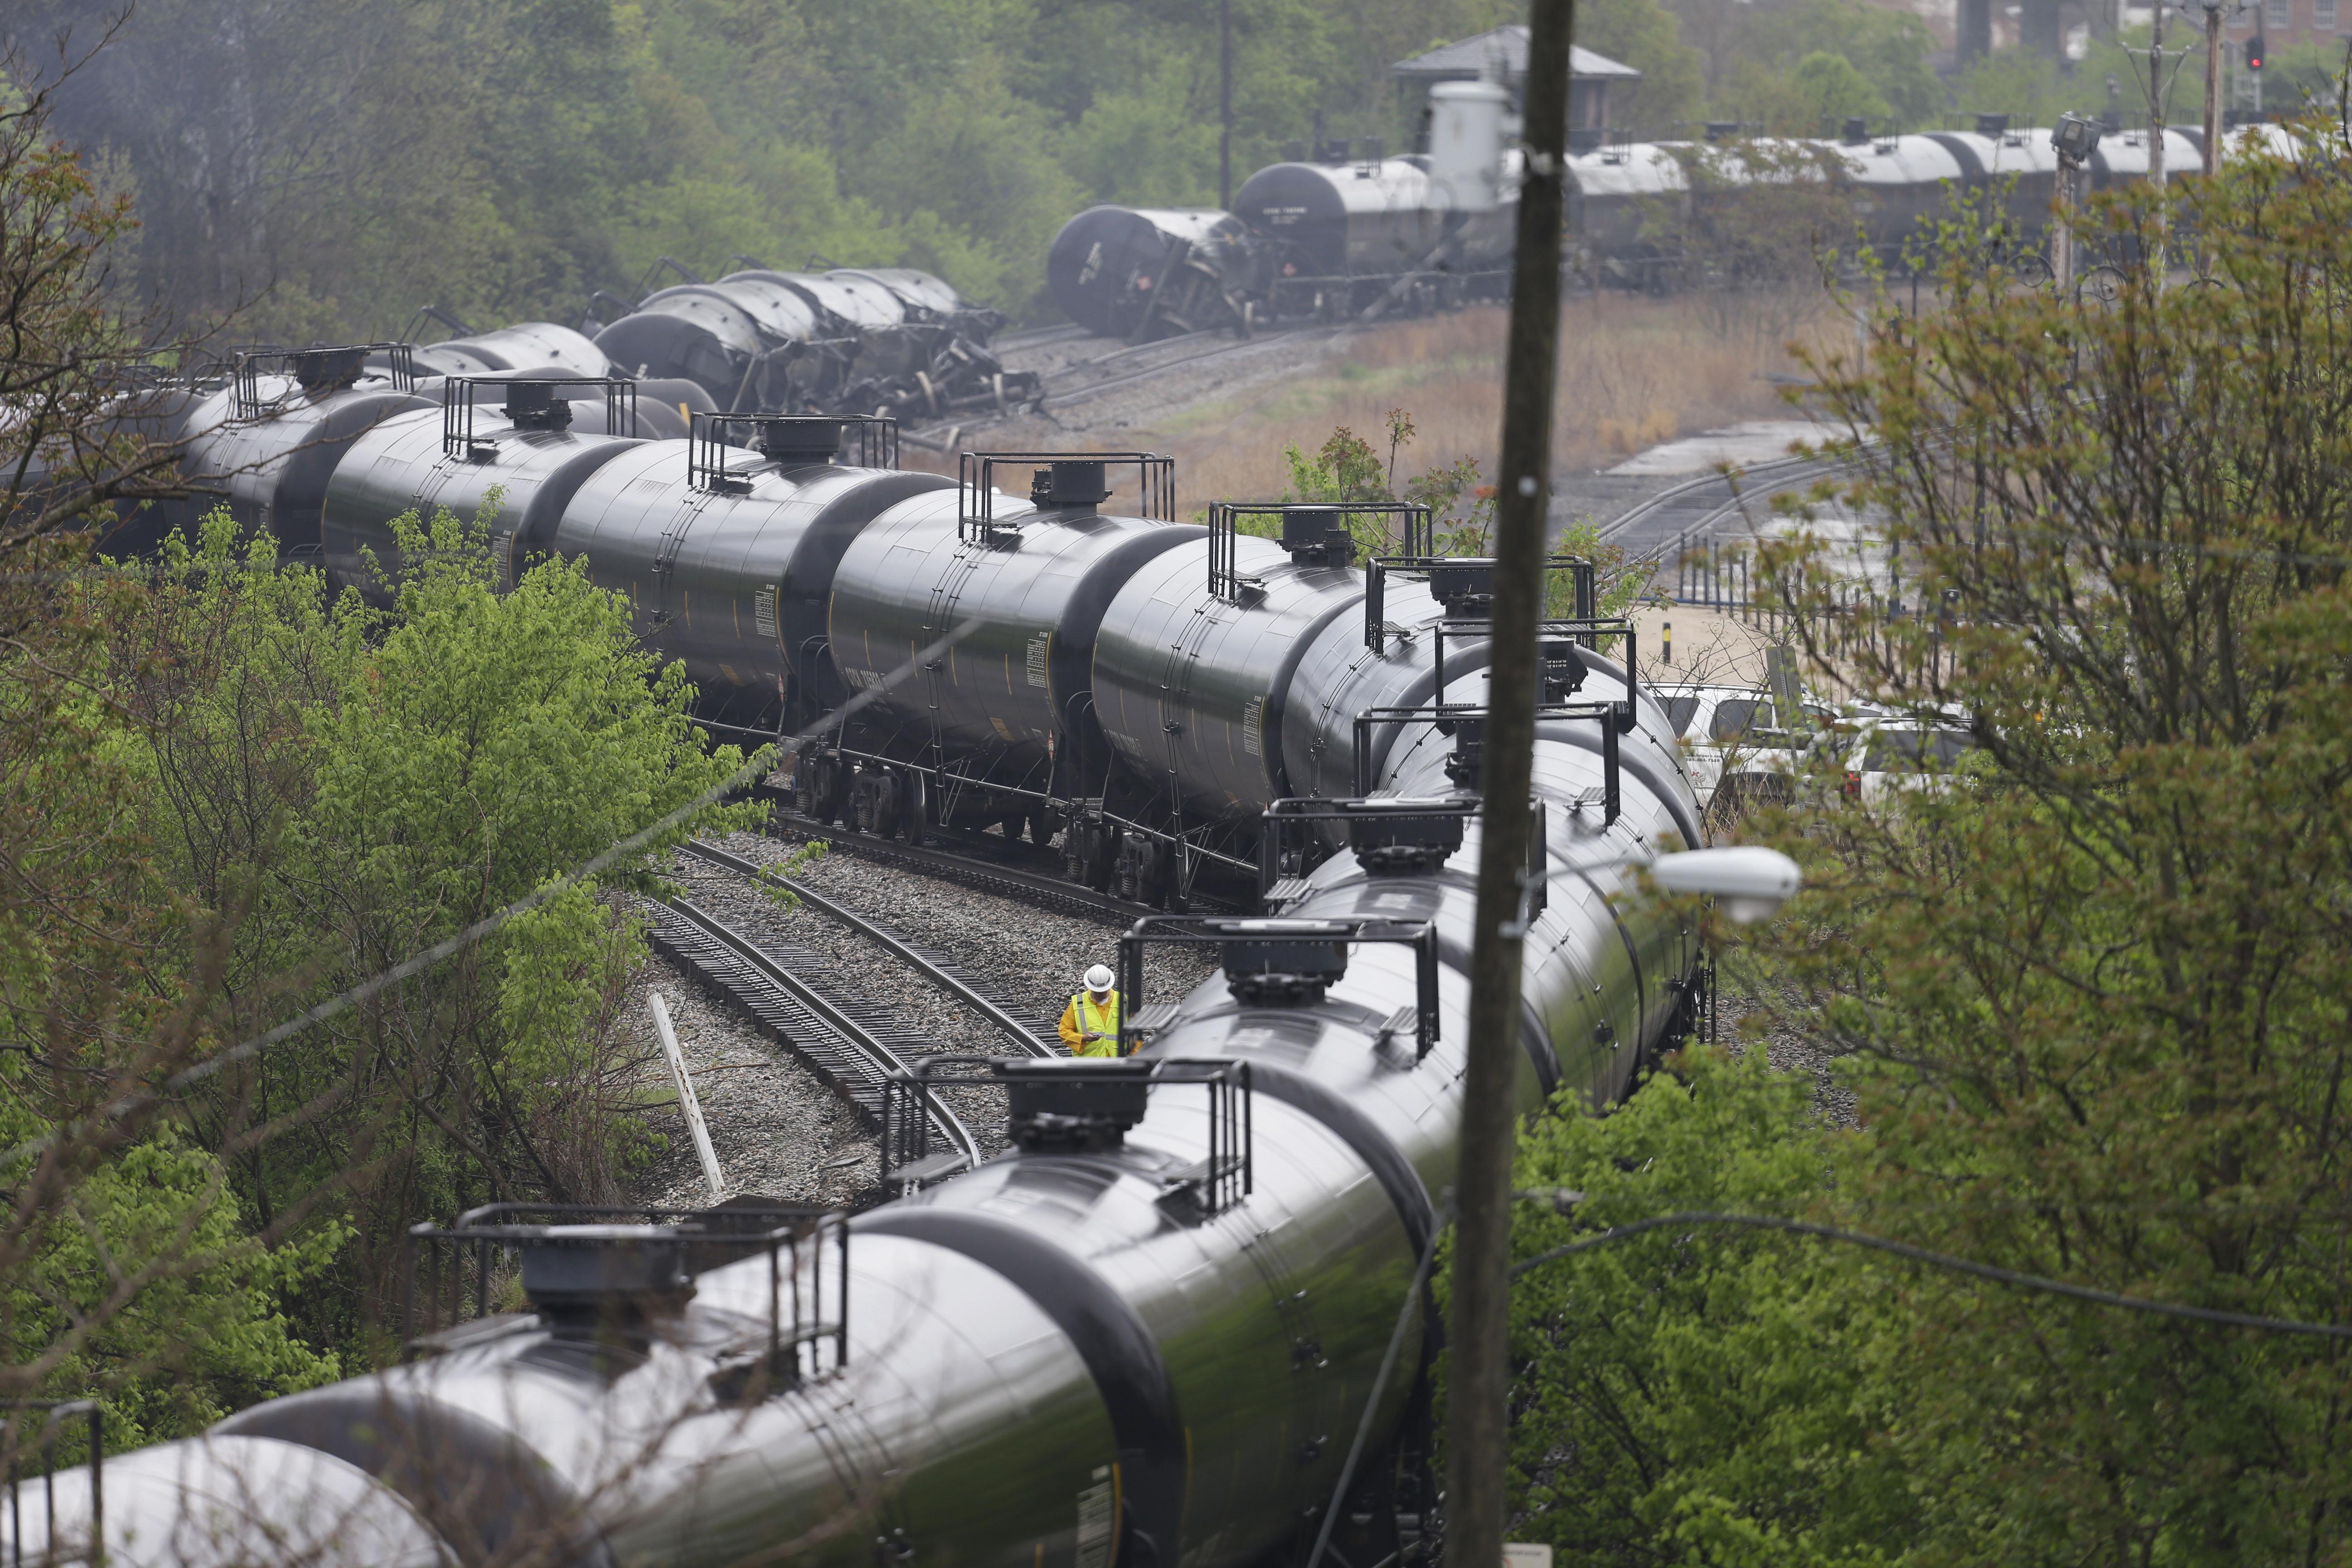 Oil train cars derail in Philadelphia | StateImpact Pennsylvania